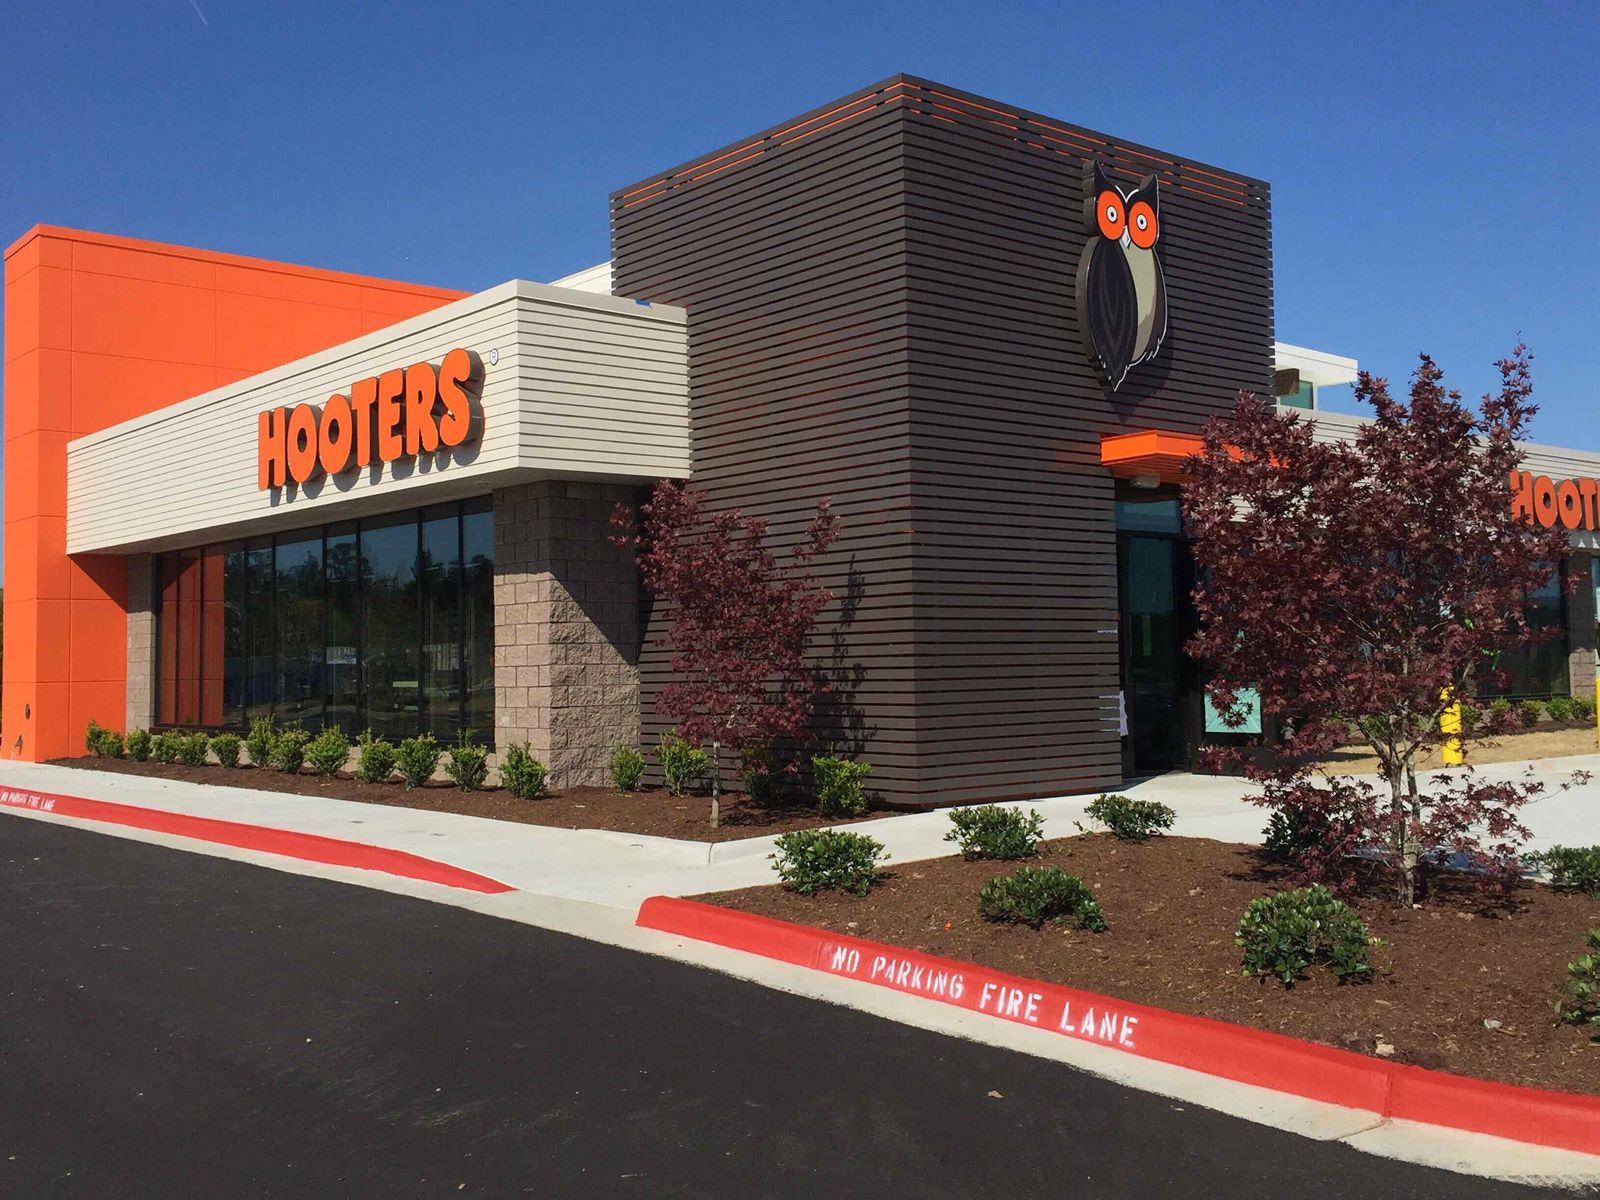 Hooters Opens Newest Location in West Little Rock, Arkansas